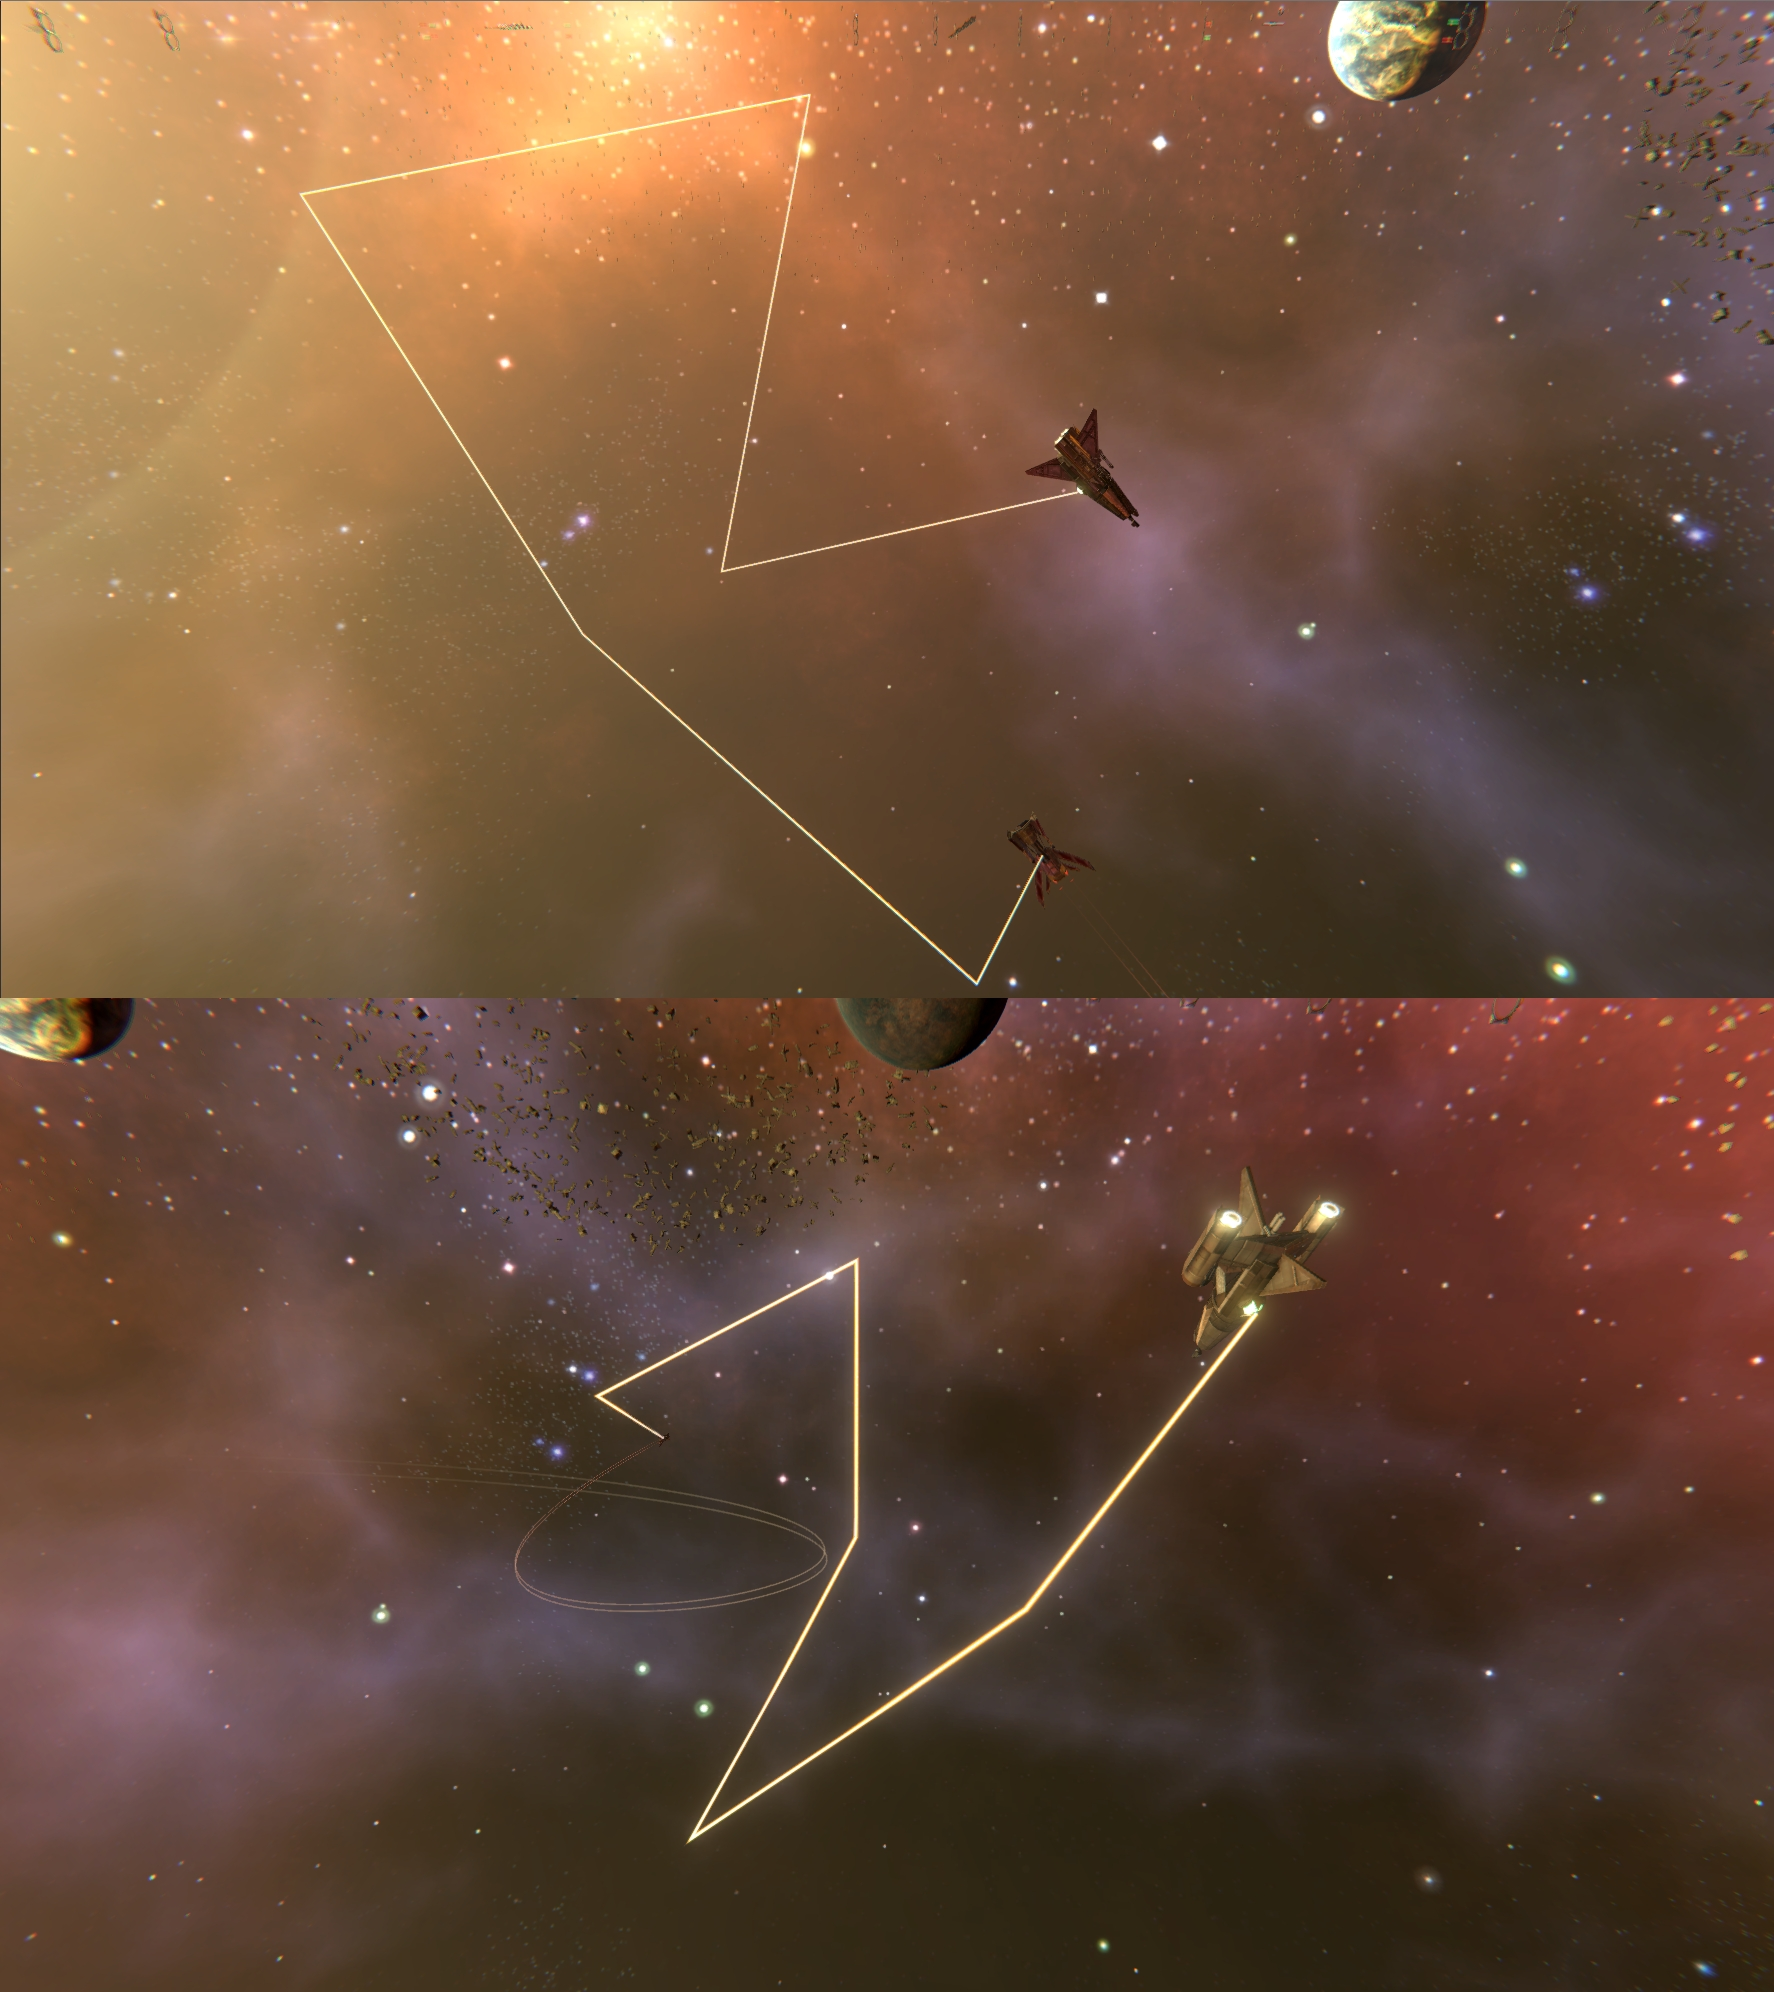 SpaceTimeBendingLaser